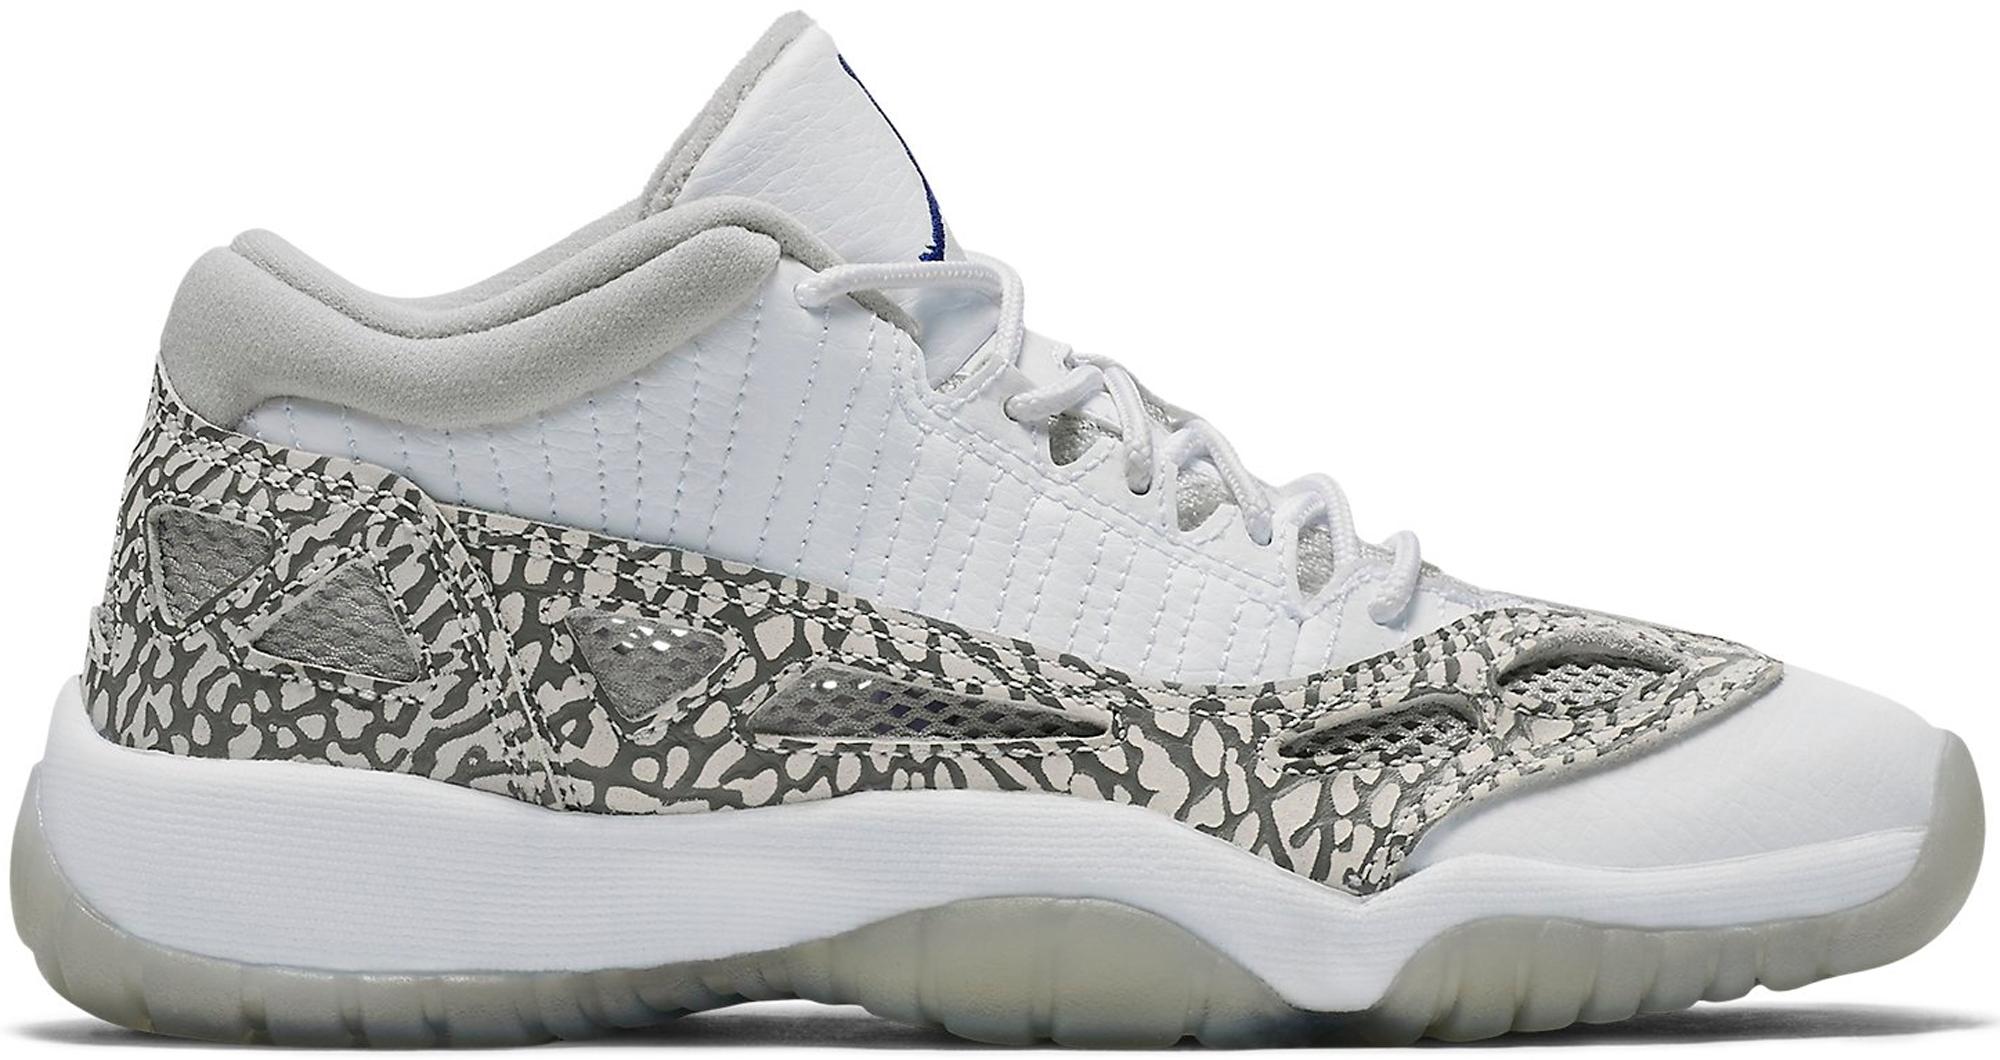 Jordan 11 Retro Low IE Cobalt 2015 (GS